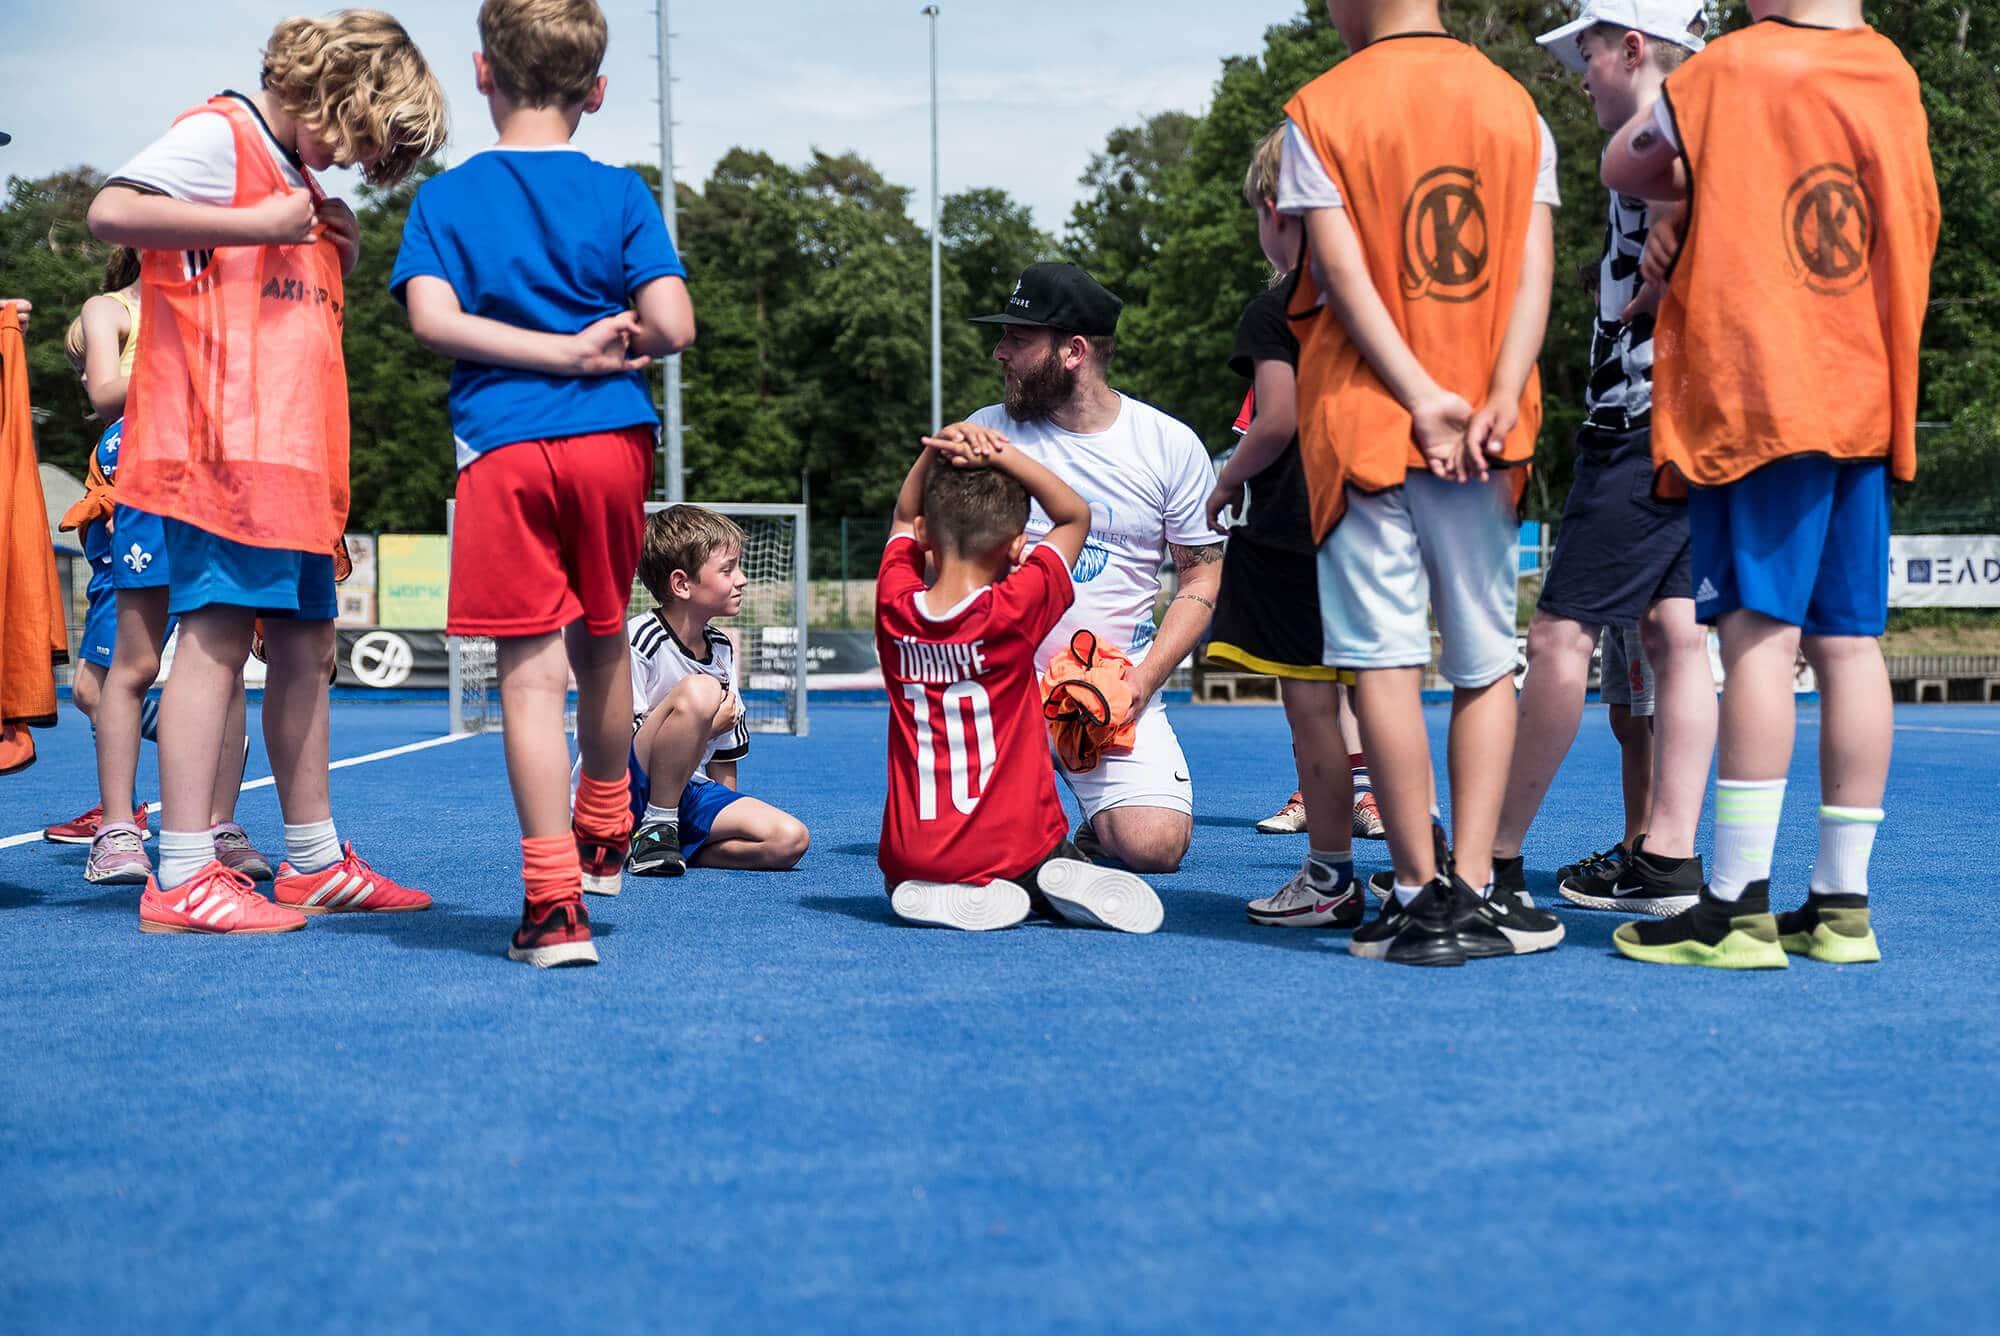 Kindersportkurs mit Toni Sailer im Amanusa Darmstadt